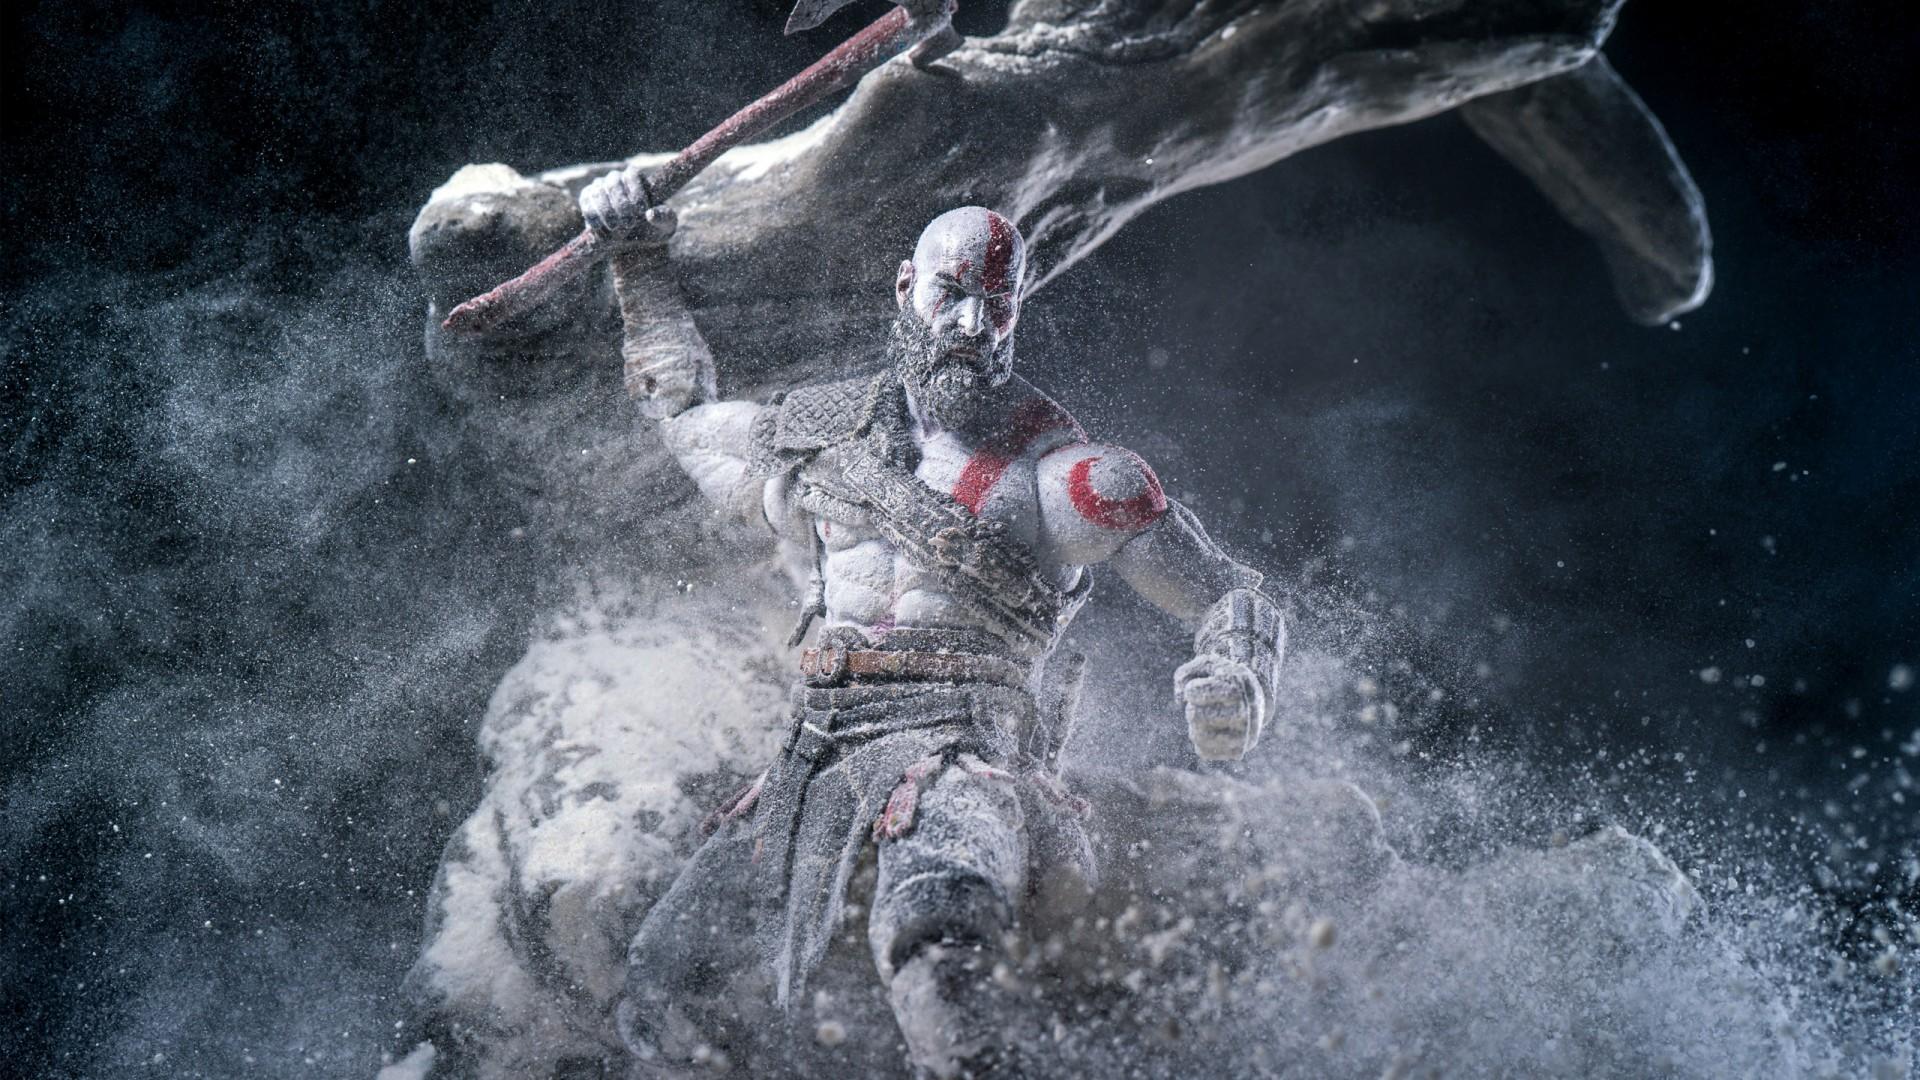 God Of War 4 Wallpaper Iphone X Kratos In God Of War 2018 Wallpapers Hd Wallpapers Id